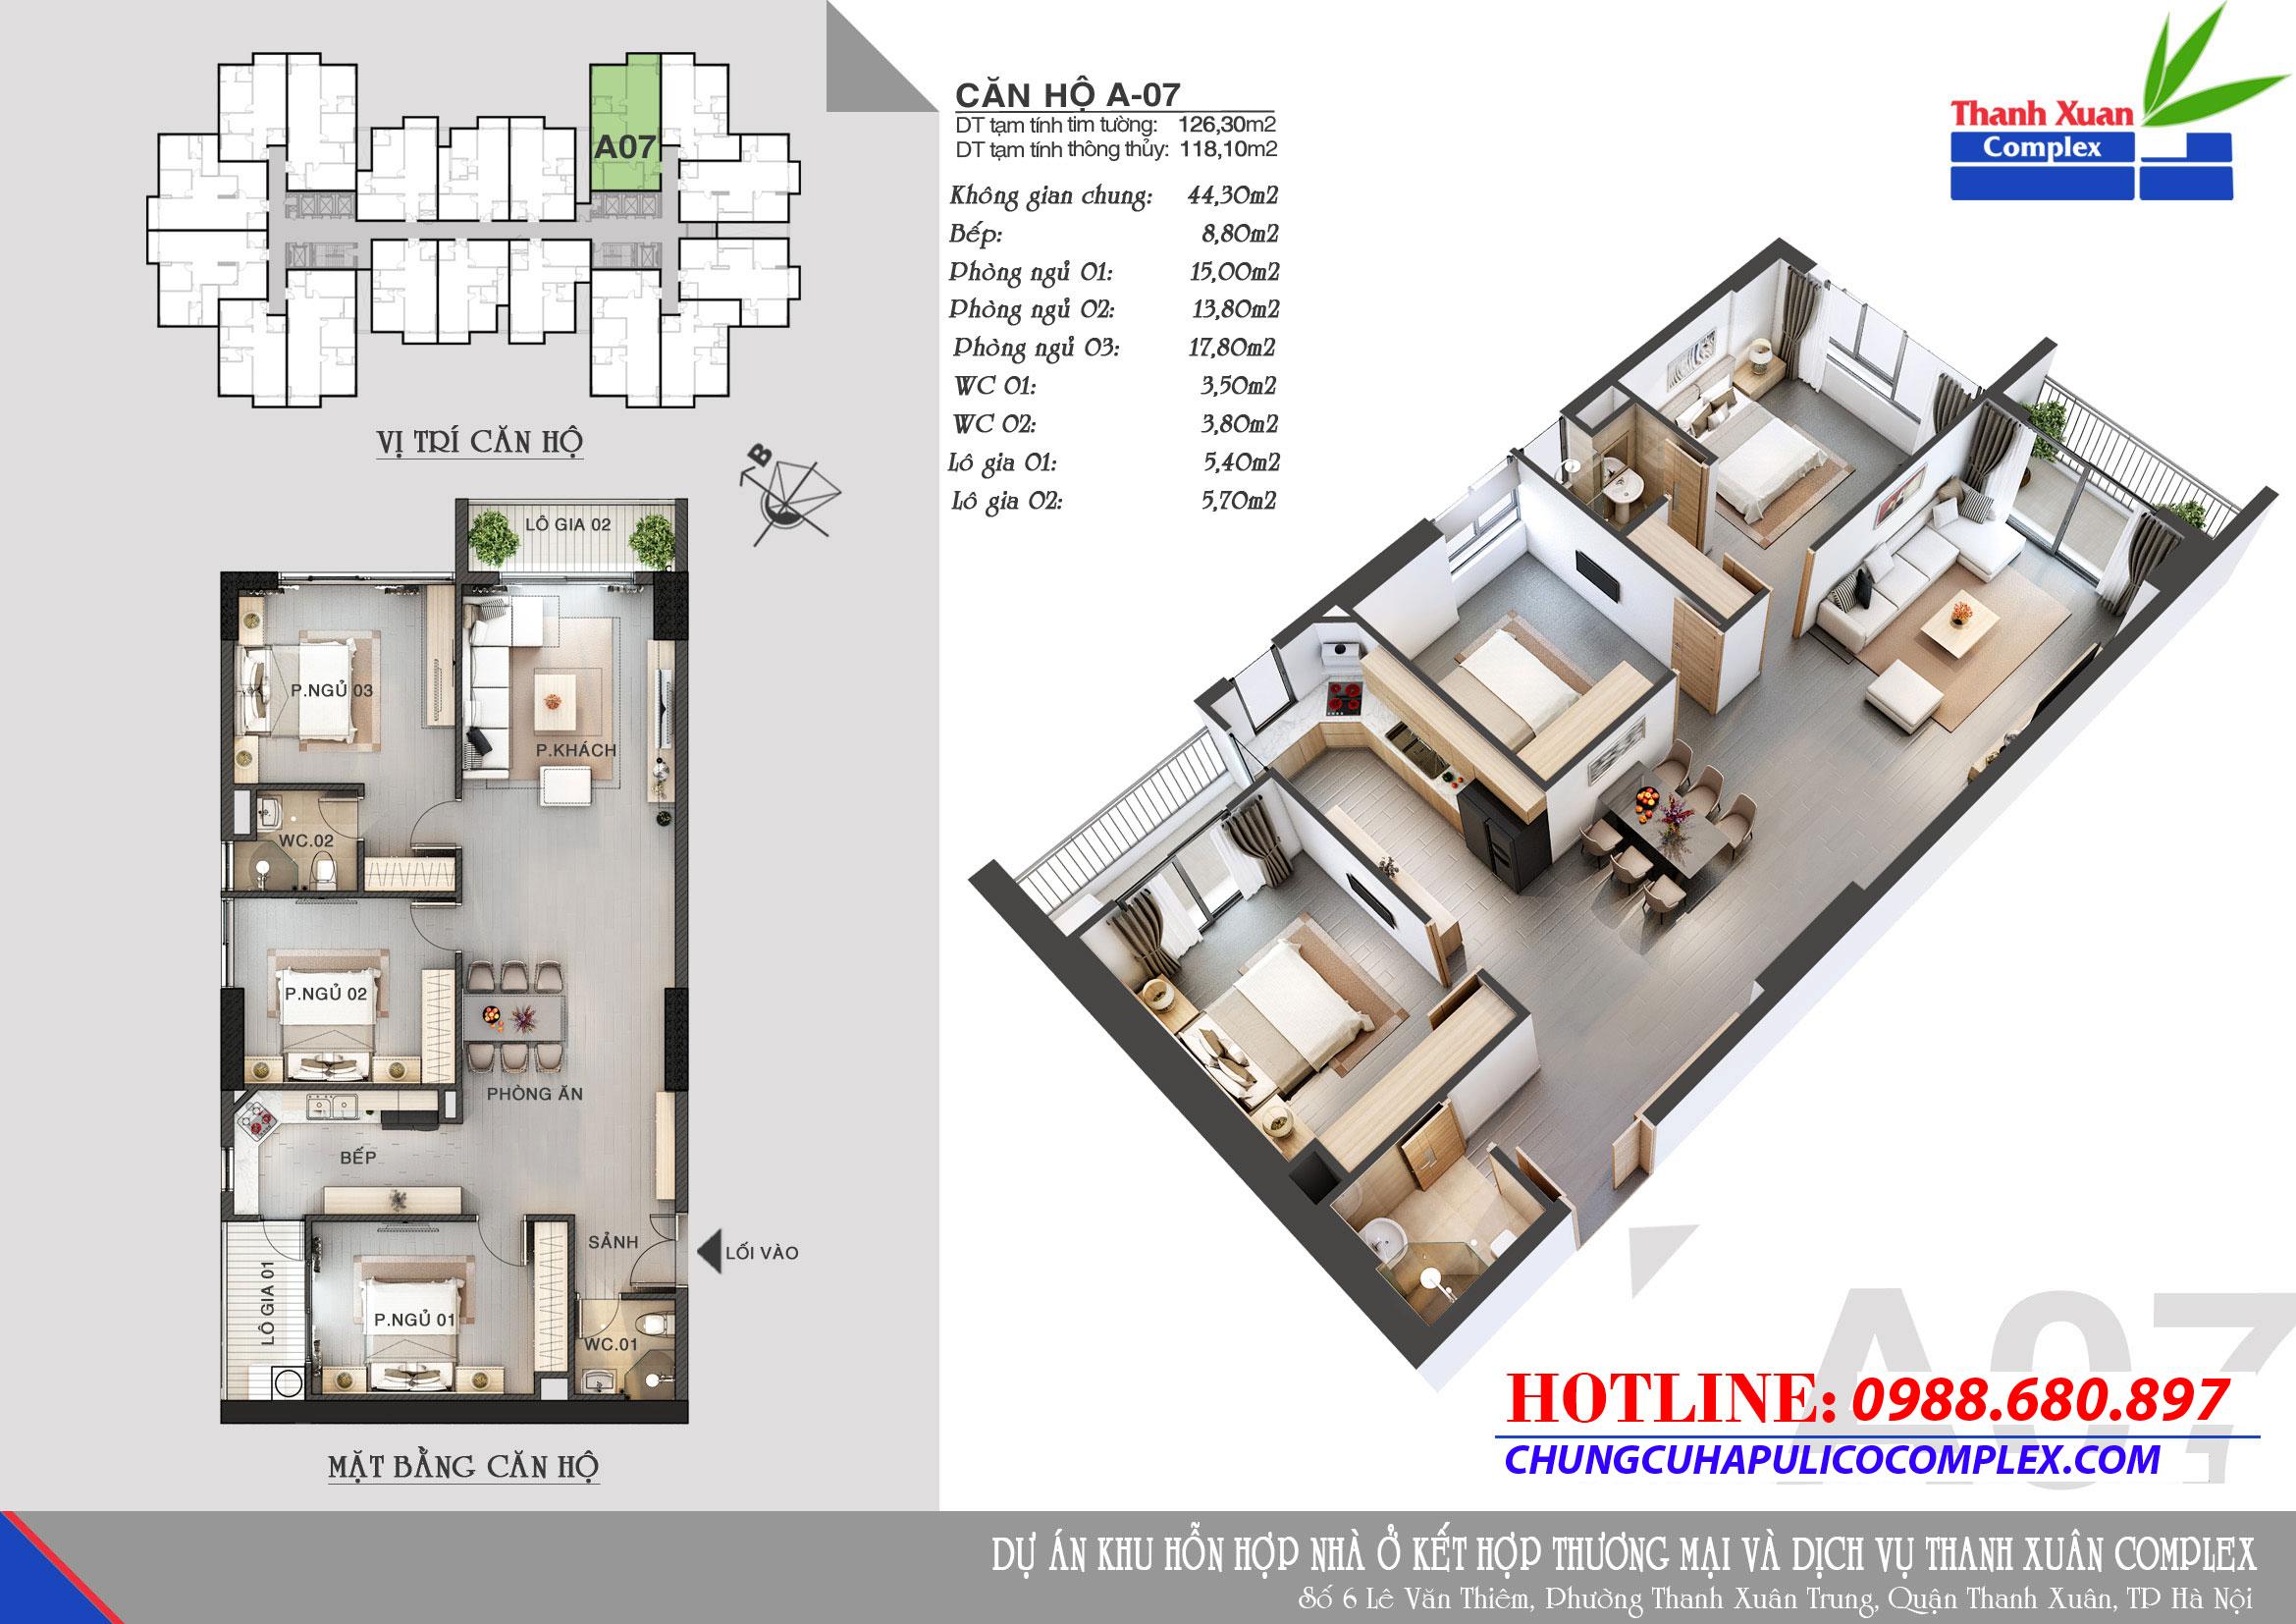 HSB_Thanhxuan-complex_CH-A07_suachotT42016-copy